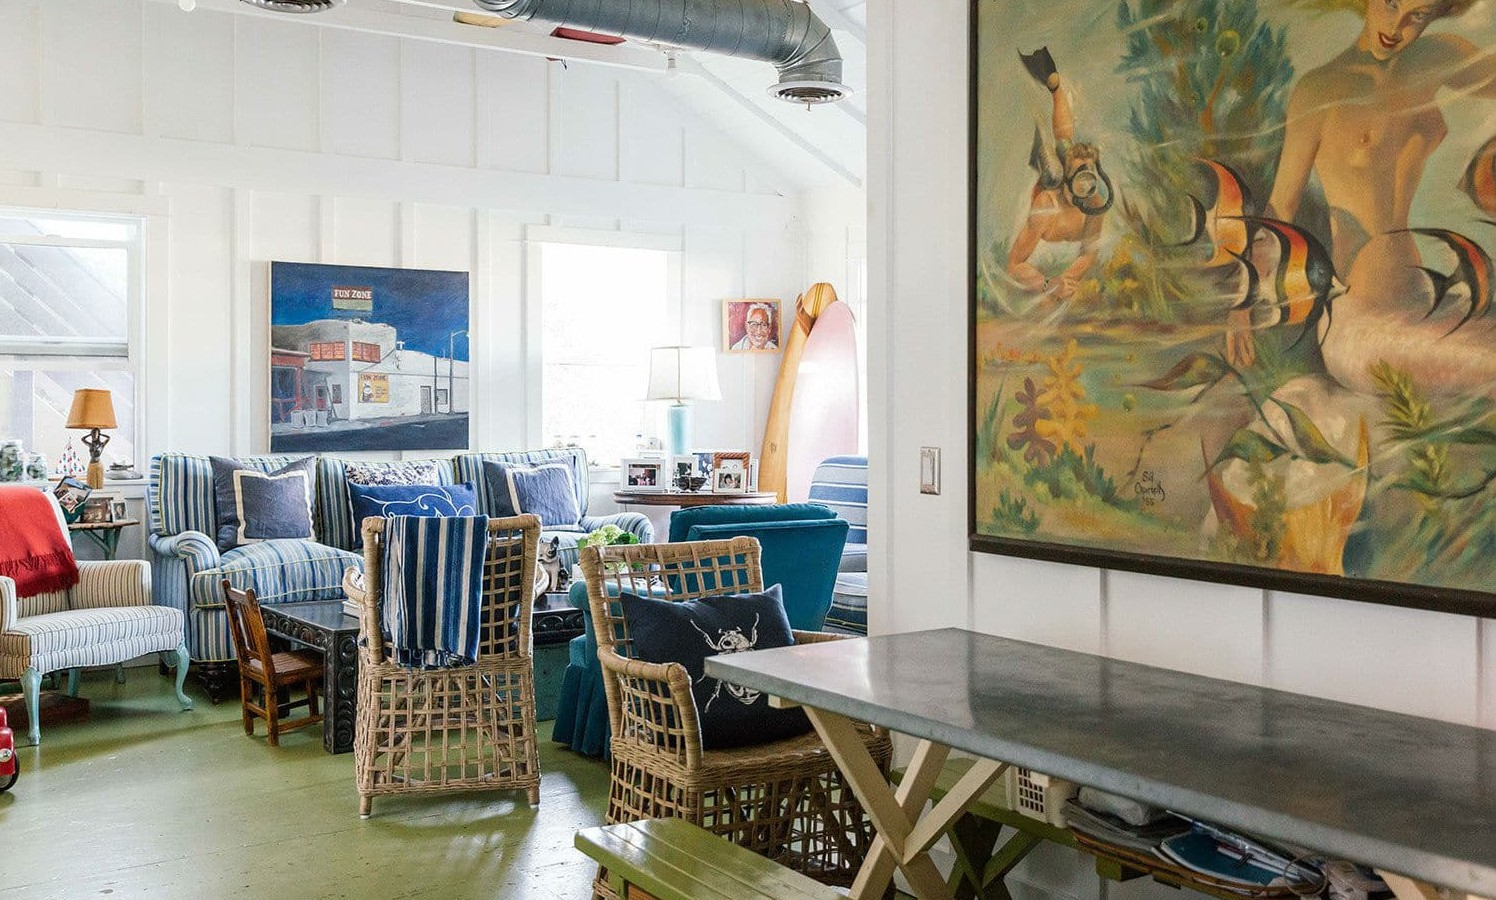 6X surf shacks de jaloersmakende woningen van surfers - Jeff Yokoyama